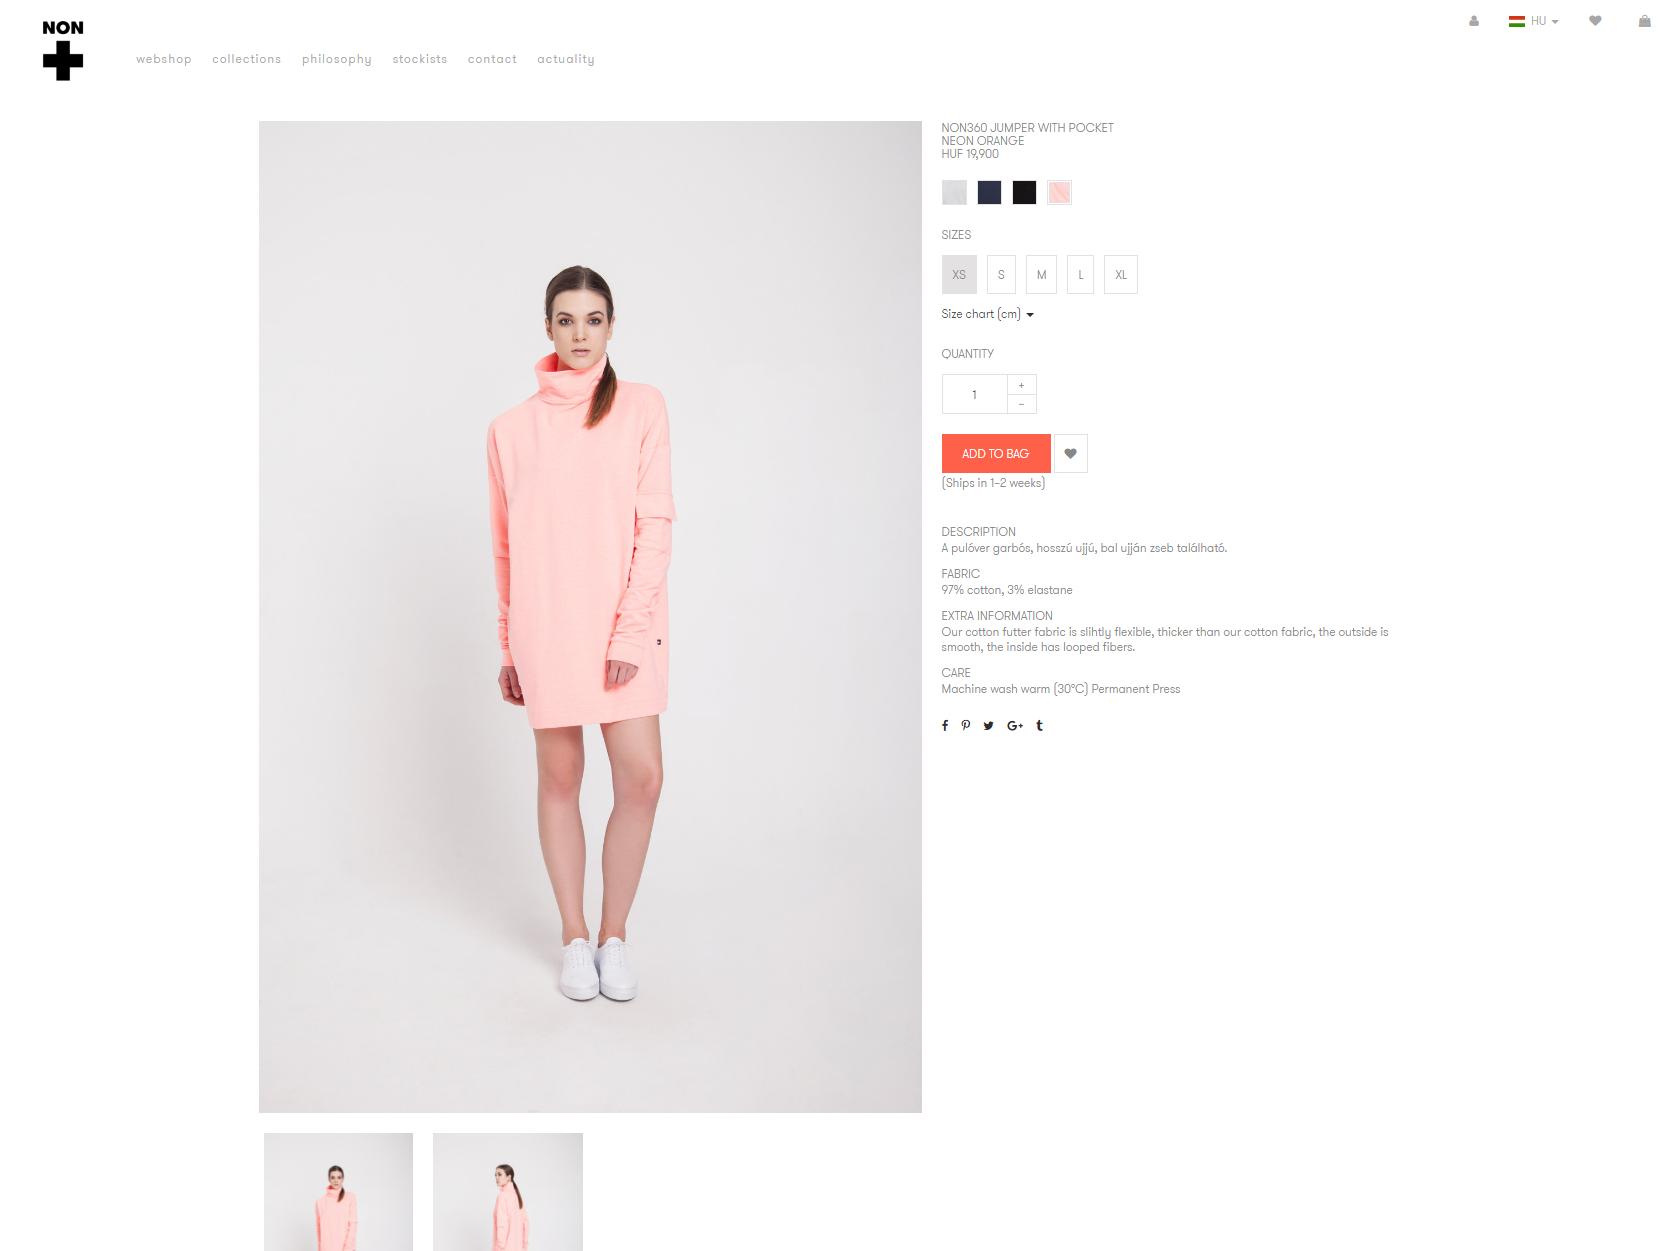 screencapture-nonplusz-hu-en-style-non360-jumper-with-pocket-neon-orange-1493821530300.png